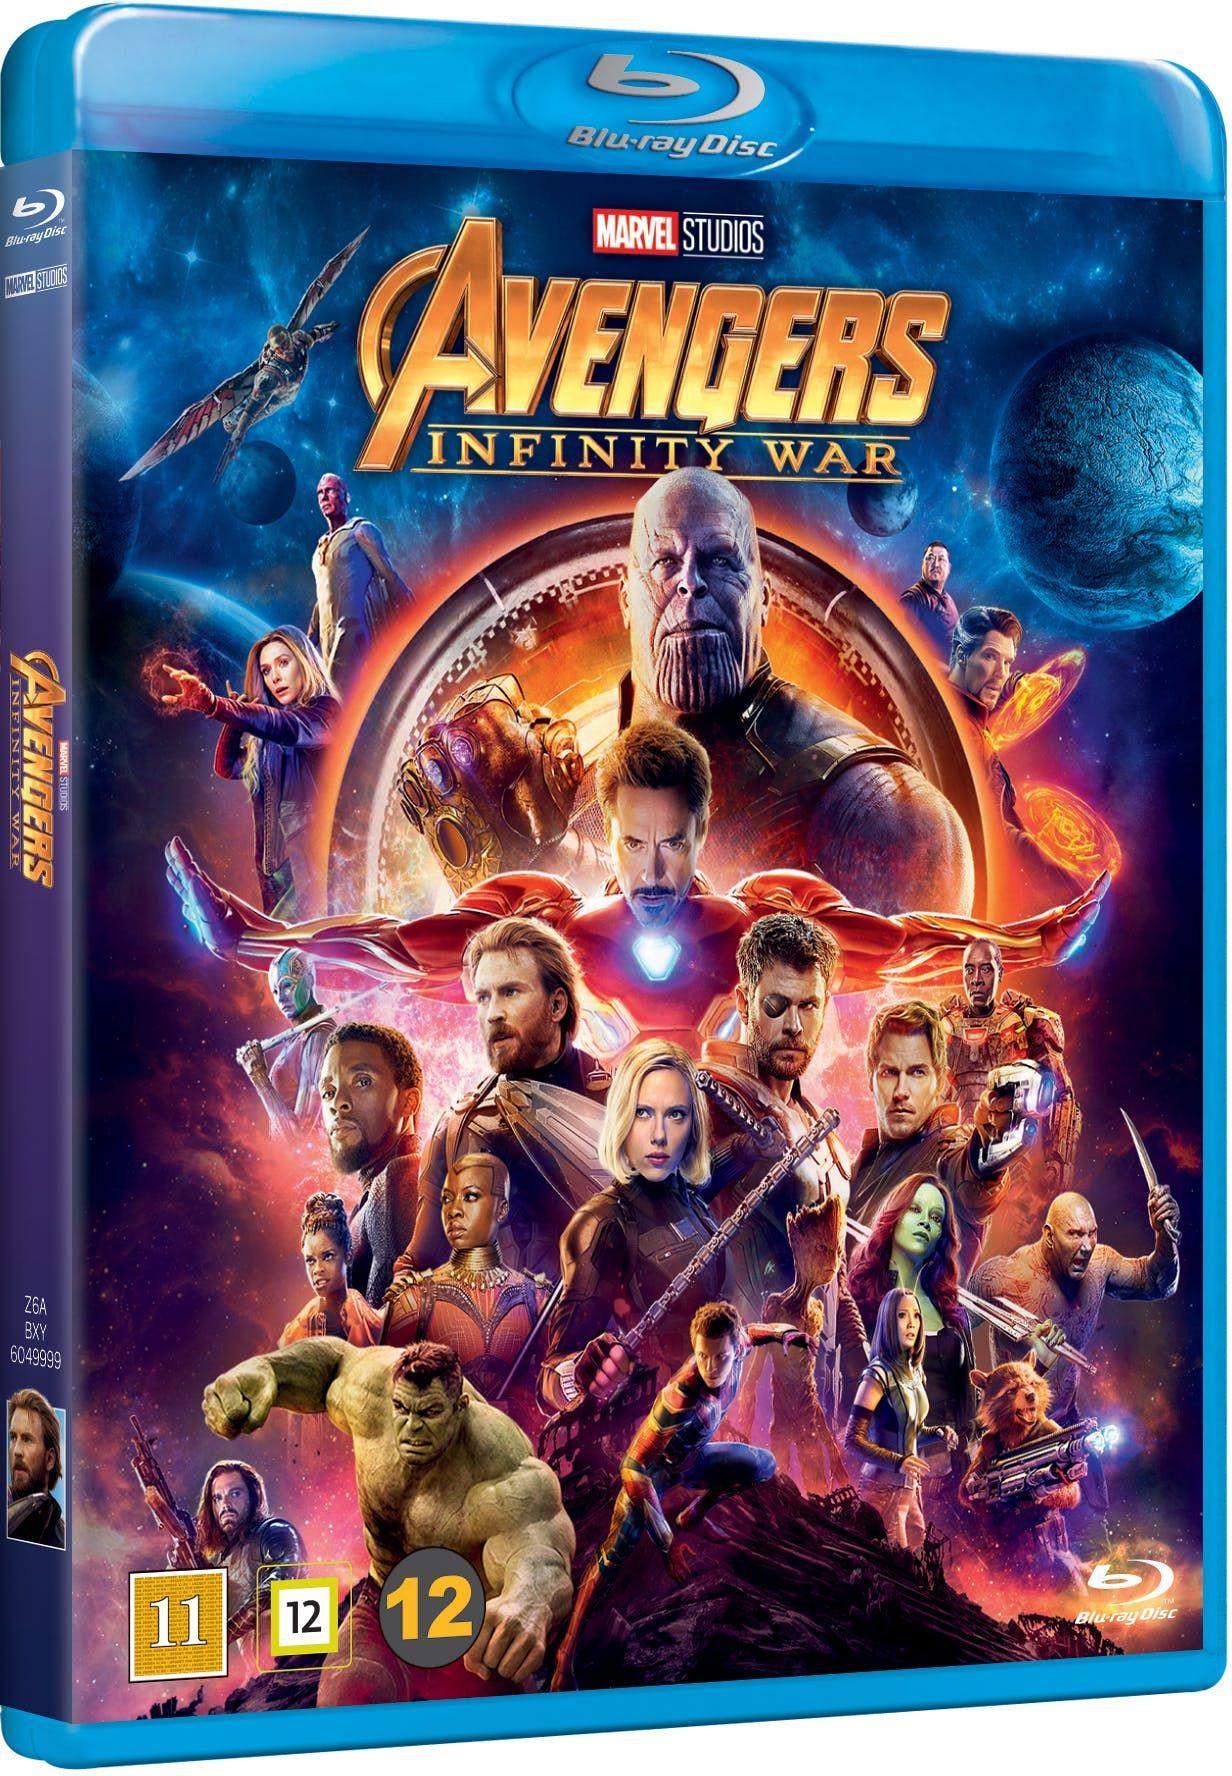 Avengers Infinity War Blu Ray Kob Online Pa Fotex Dk The Avengers Avengers Og Marvel Avengers